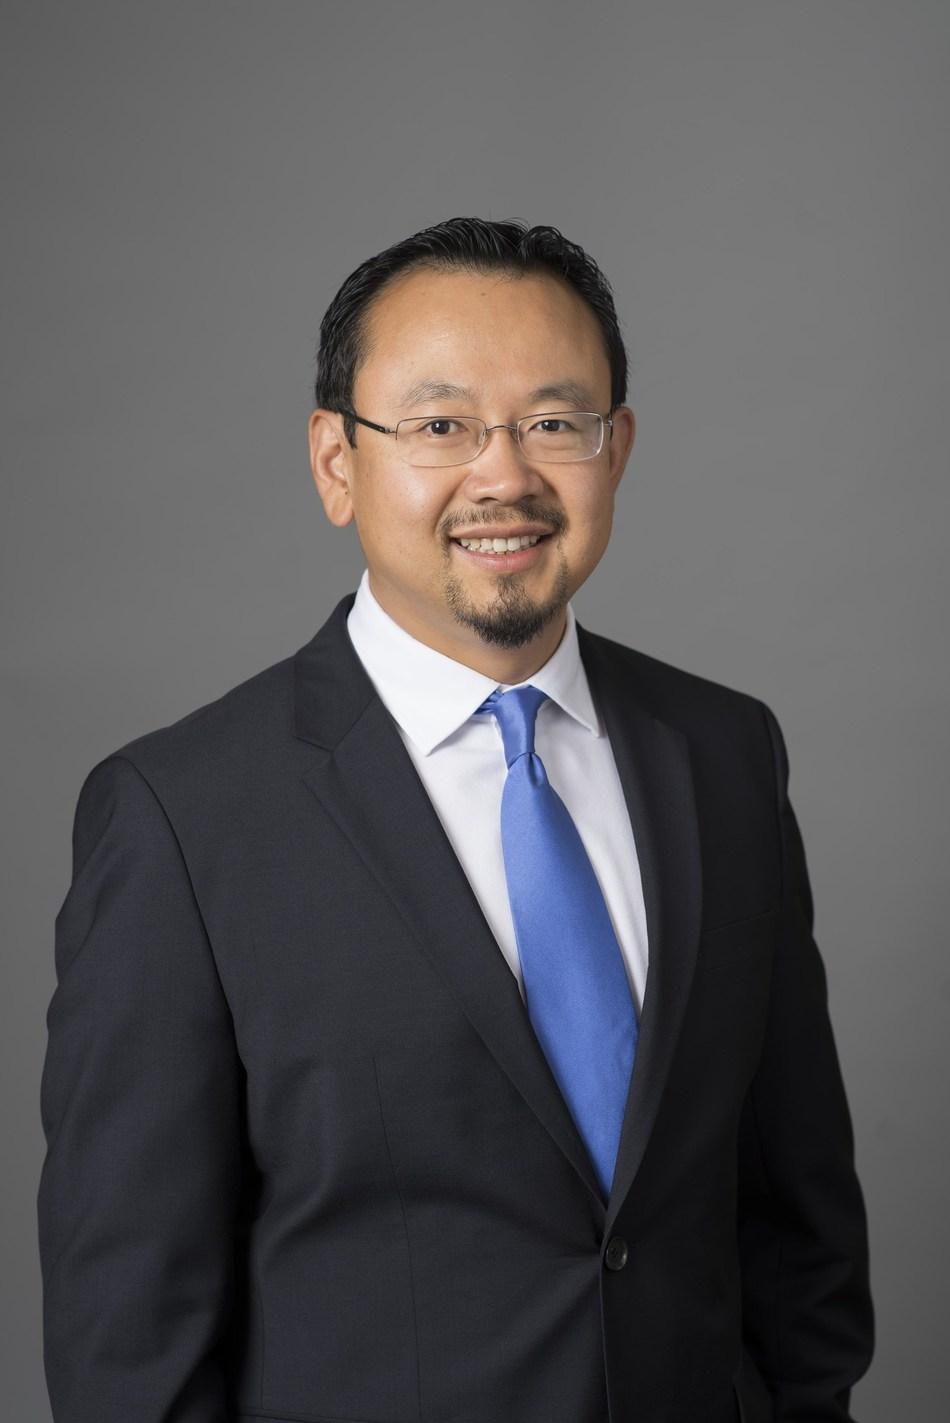 Zhen Su, M.D., MBA, Chief Medical Officer, North America, EMD Serono